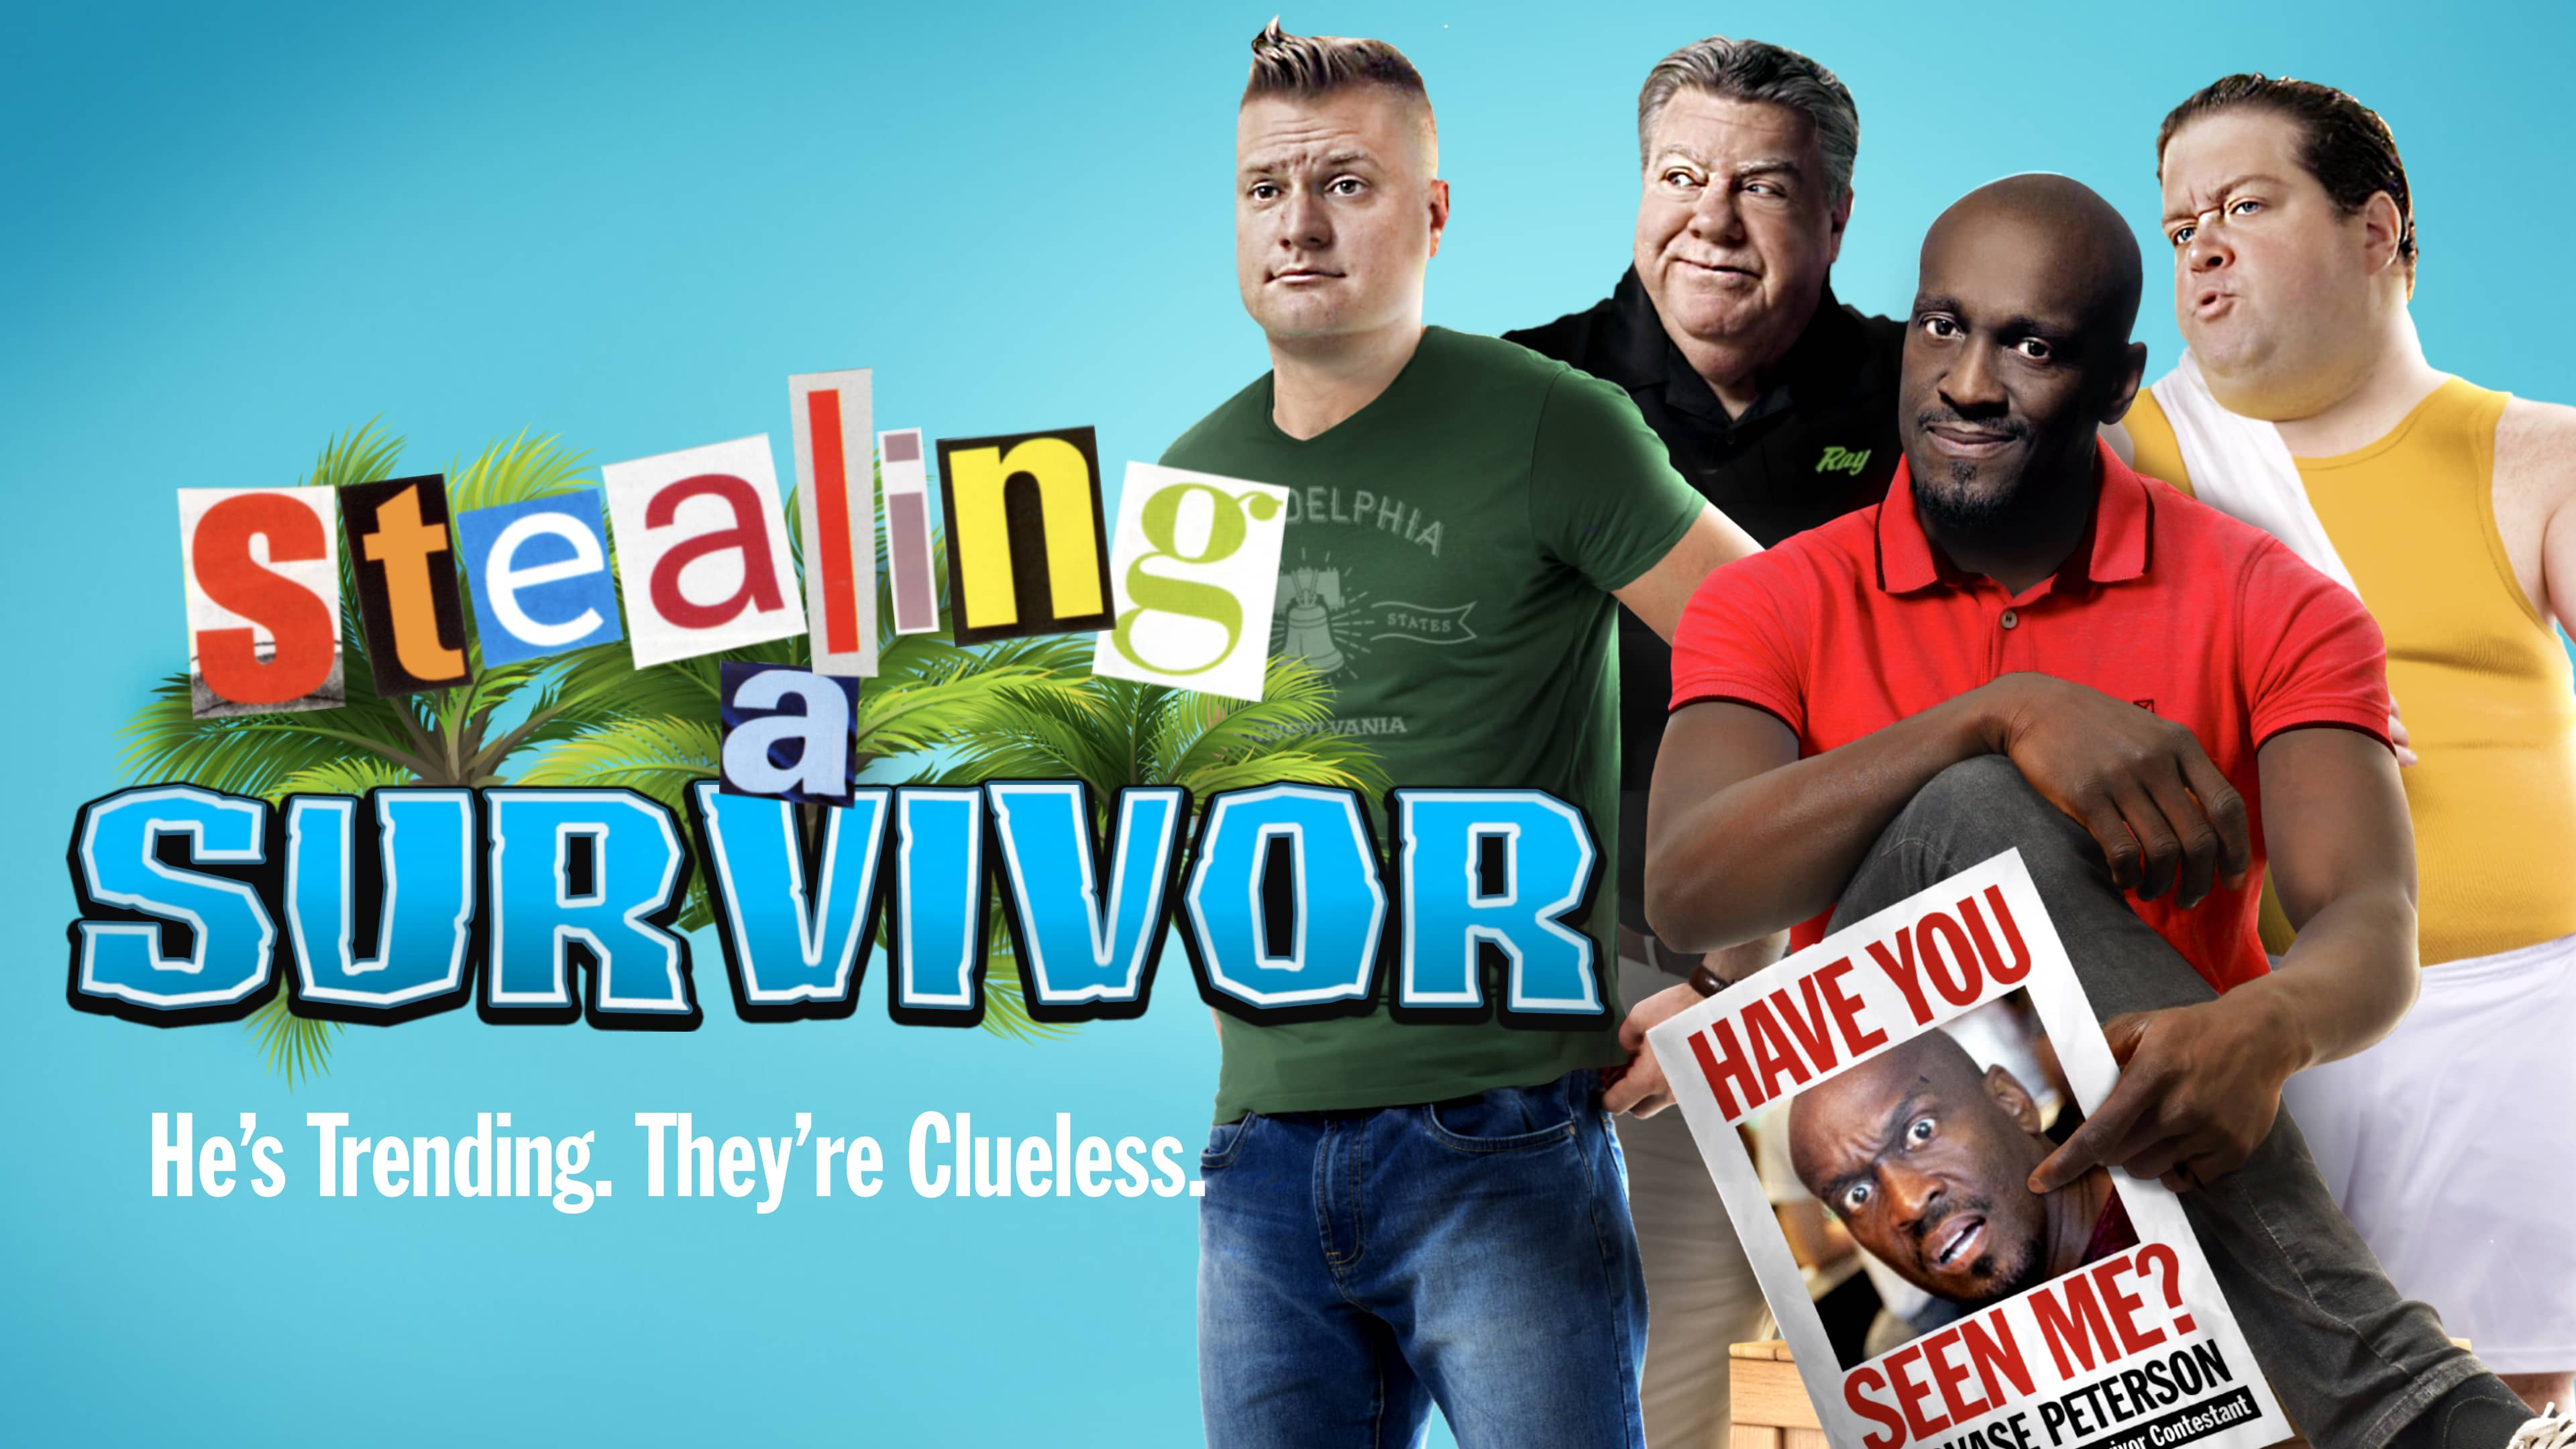 Stealing a Survivor Comedy